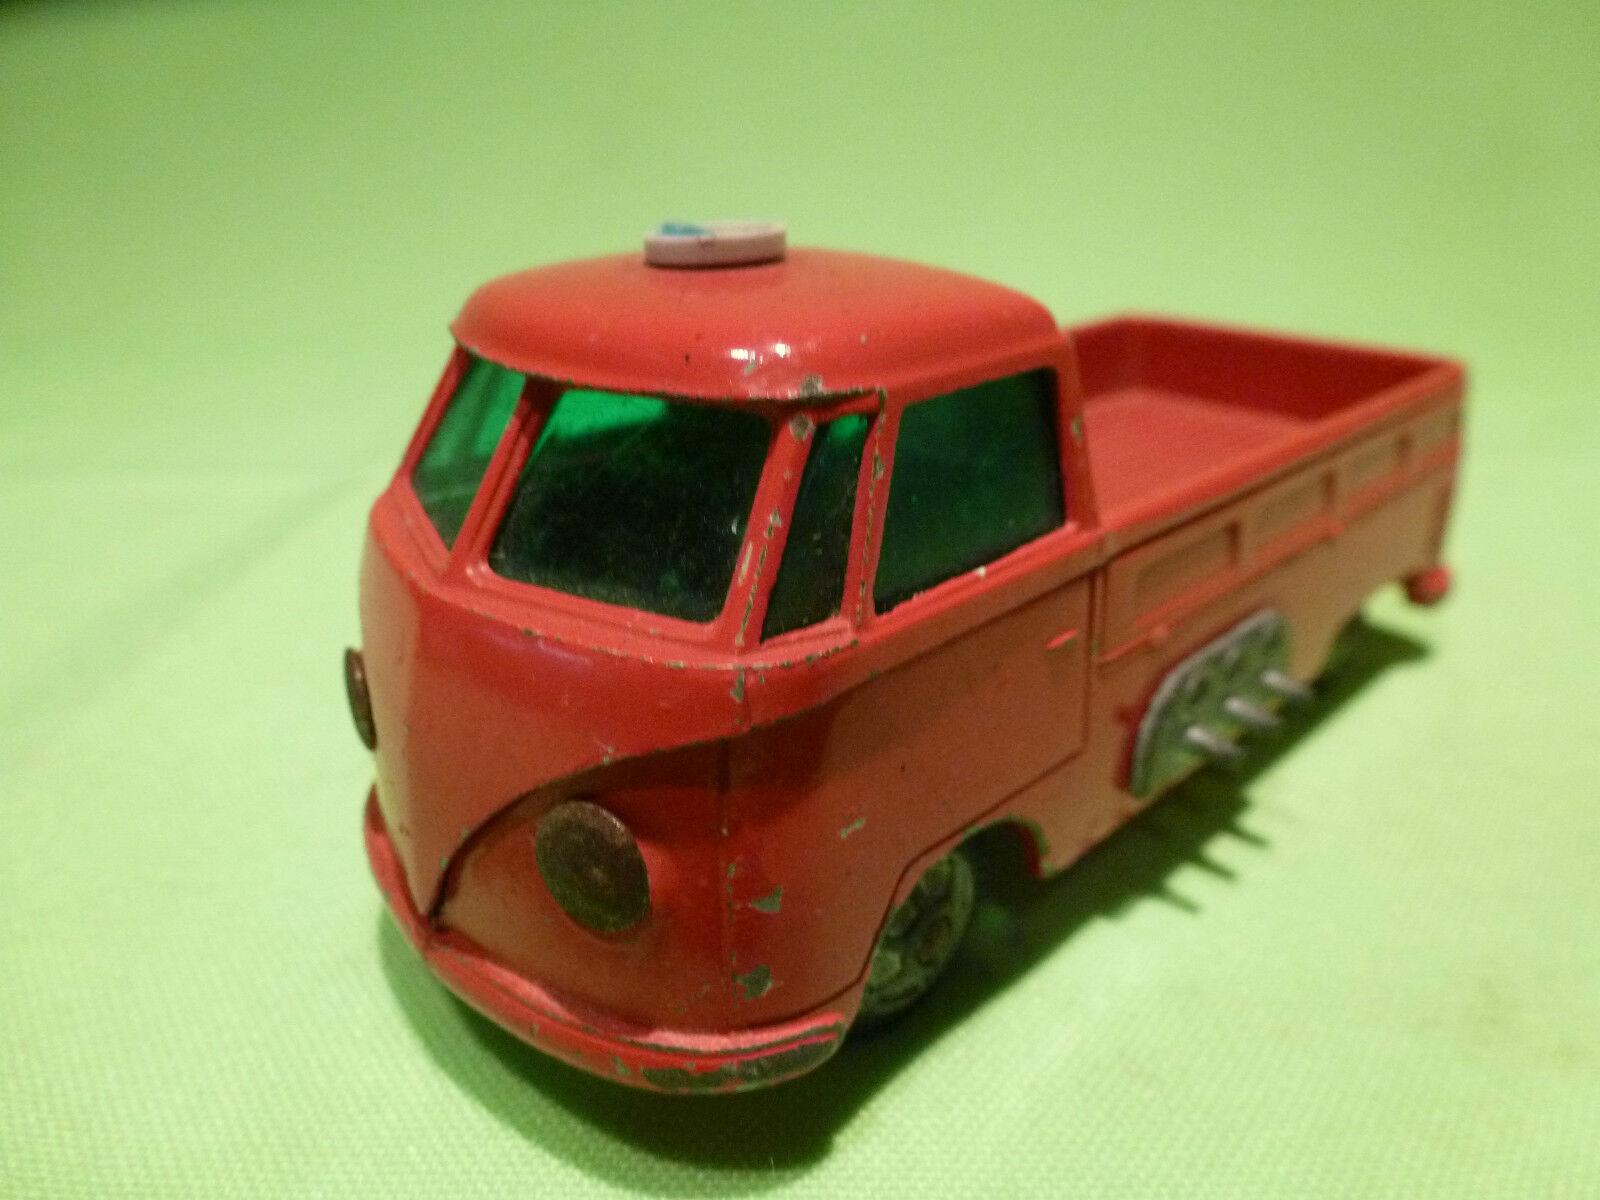 TEKNO DENMARK  1 43   VOLKSWAGEN BUS  - FEUERWEHR  - VW BUS   IN GOOD CONDITION